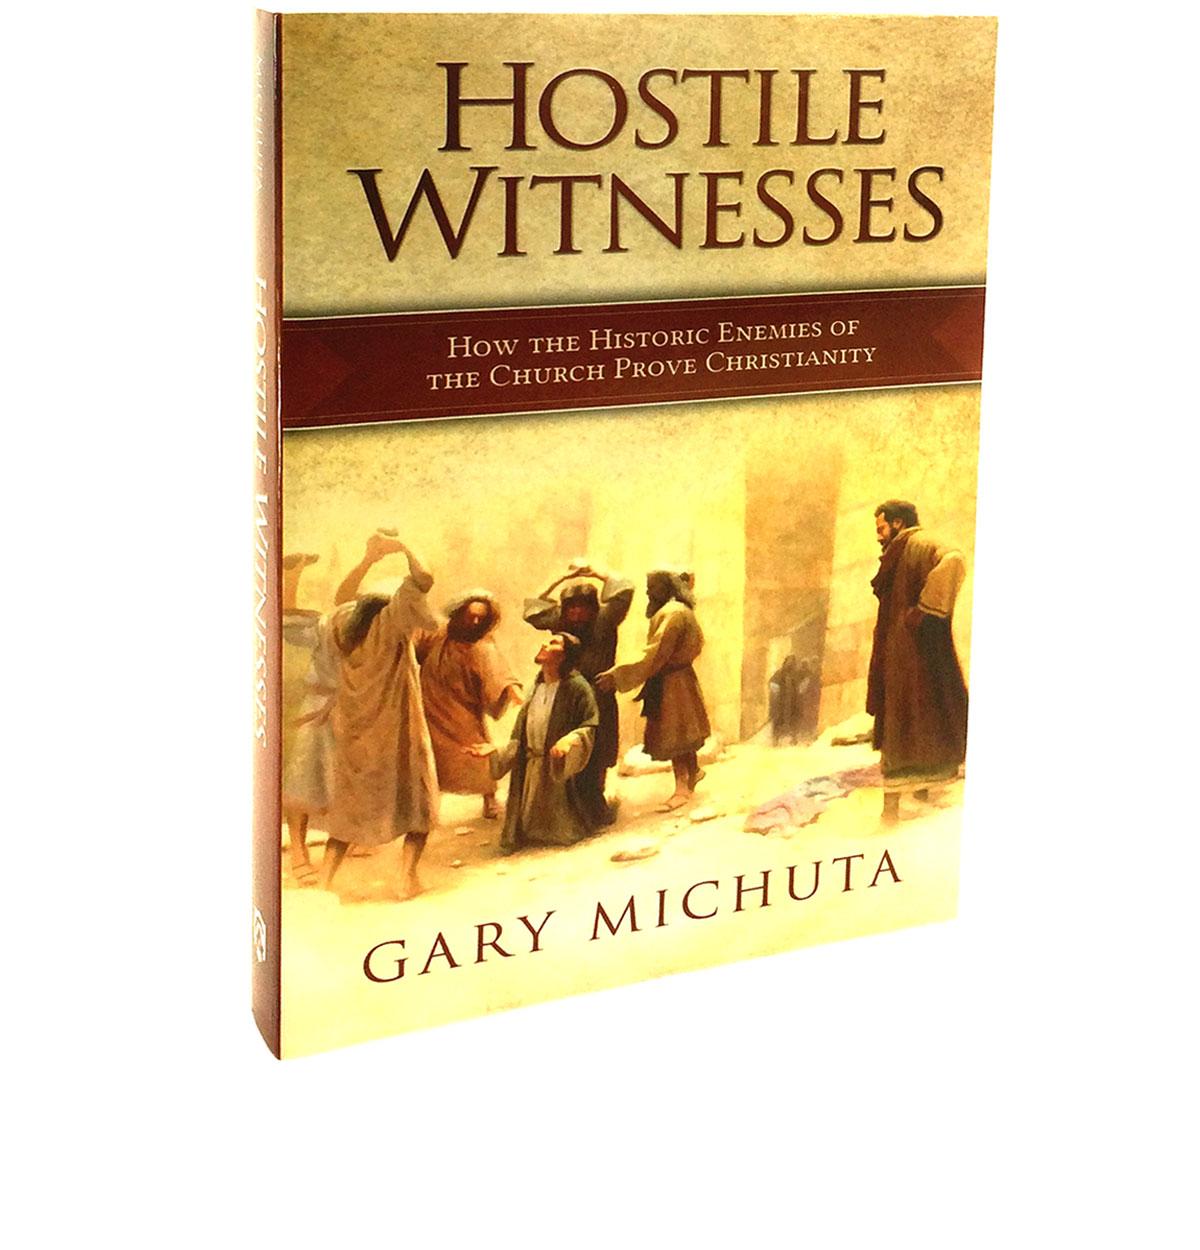 hostile-witnesses-michuta.jpg